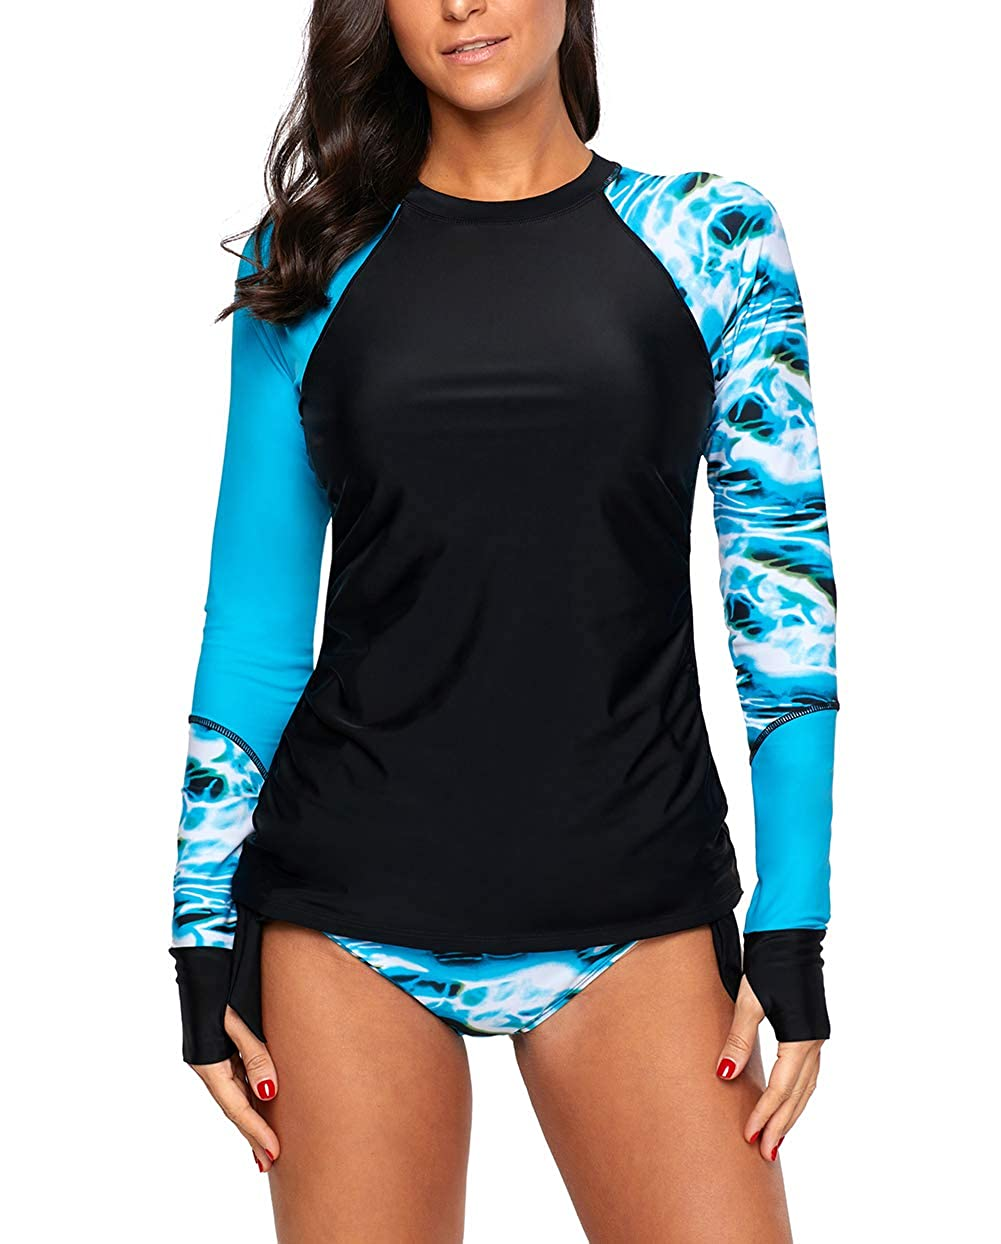 Womens Diving Swimwear Long Sleeve Surf Suit Tankini Swimsuit Beach Rash Guard